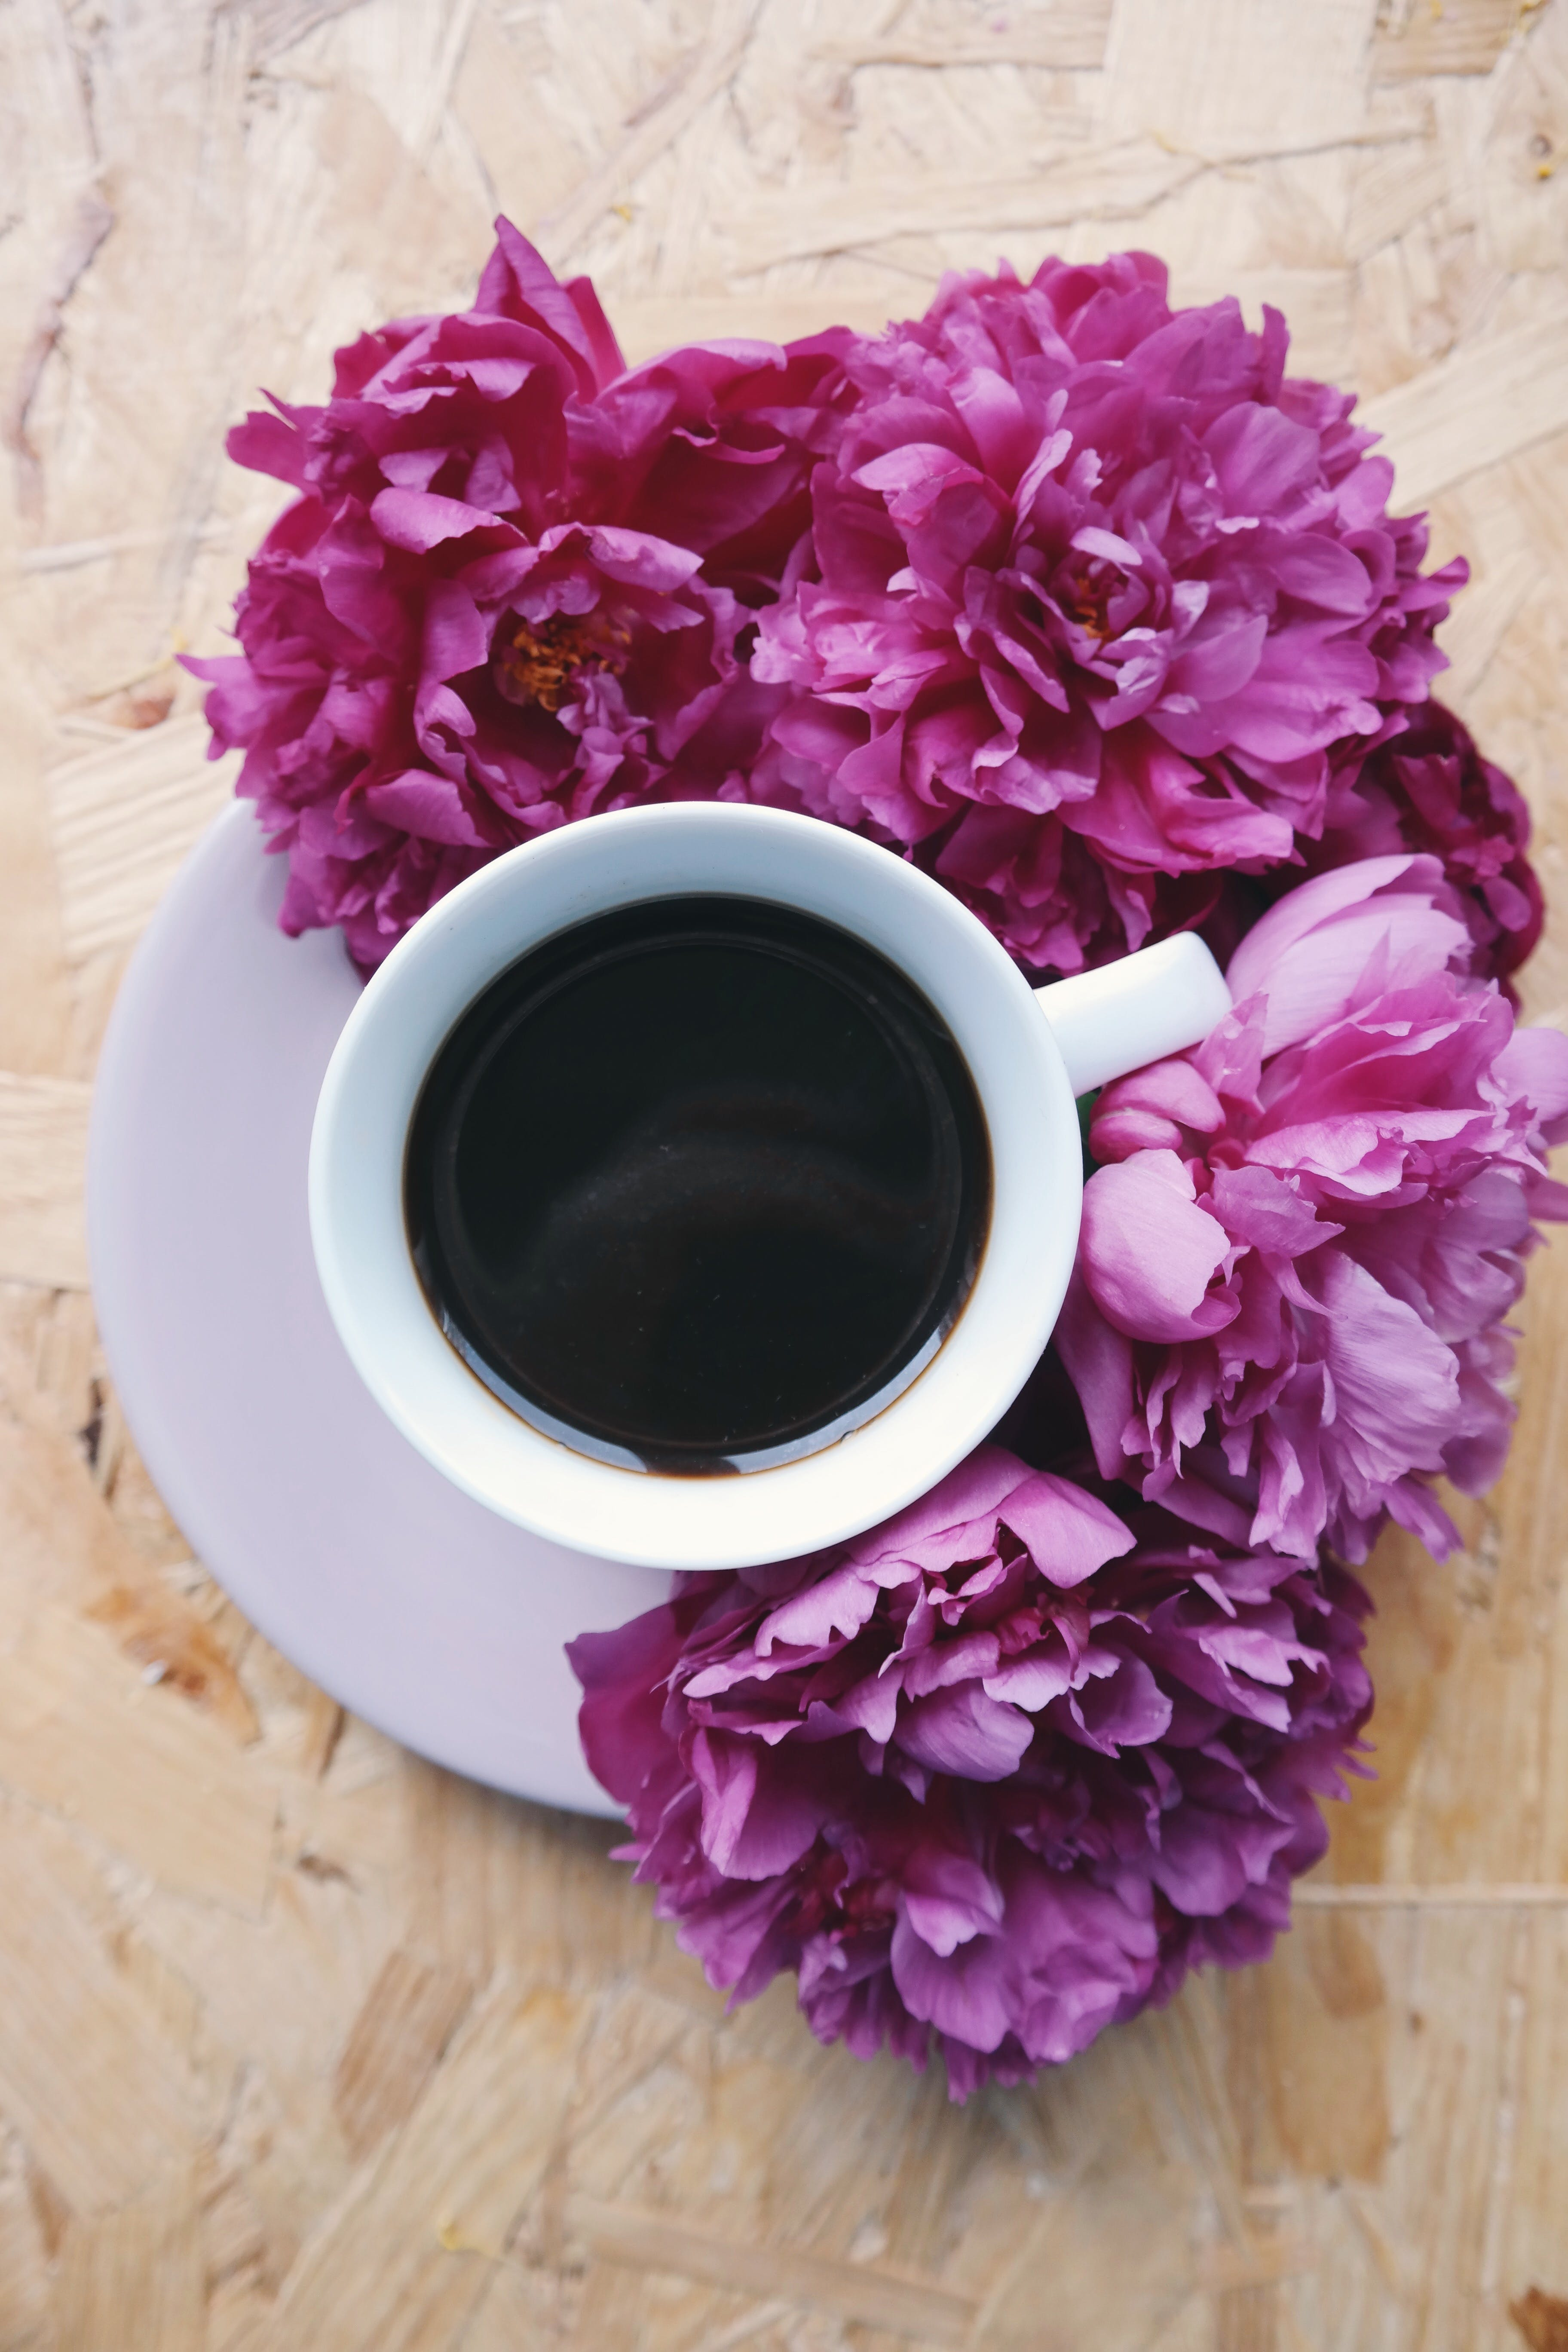 Cup of Coffee Beside Flowers